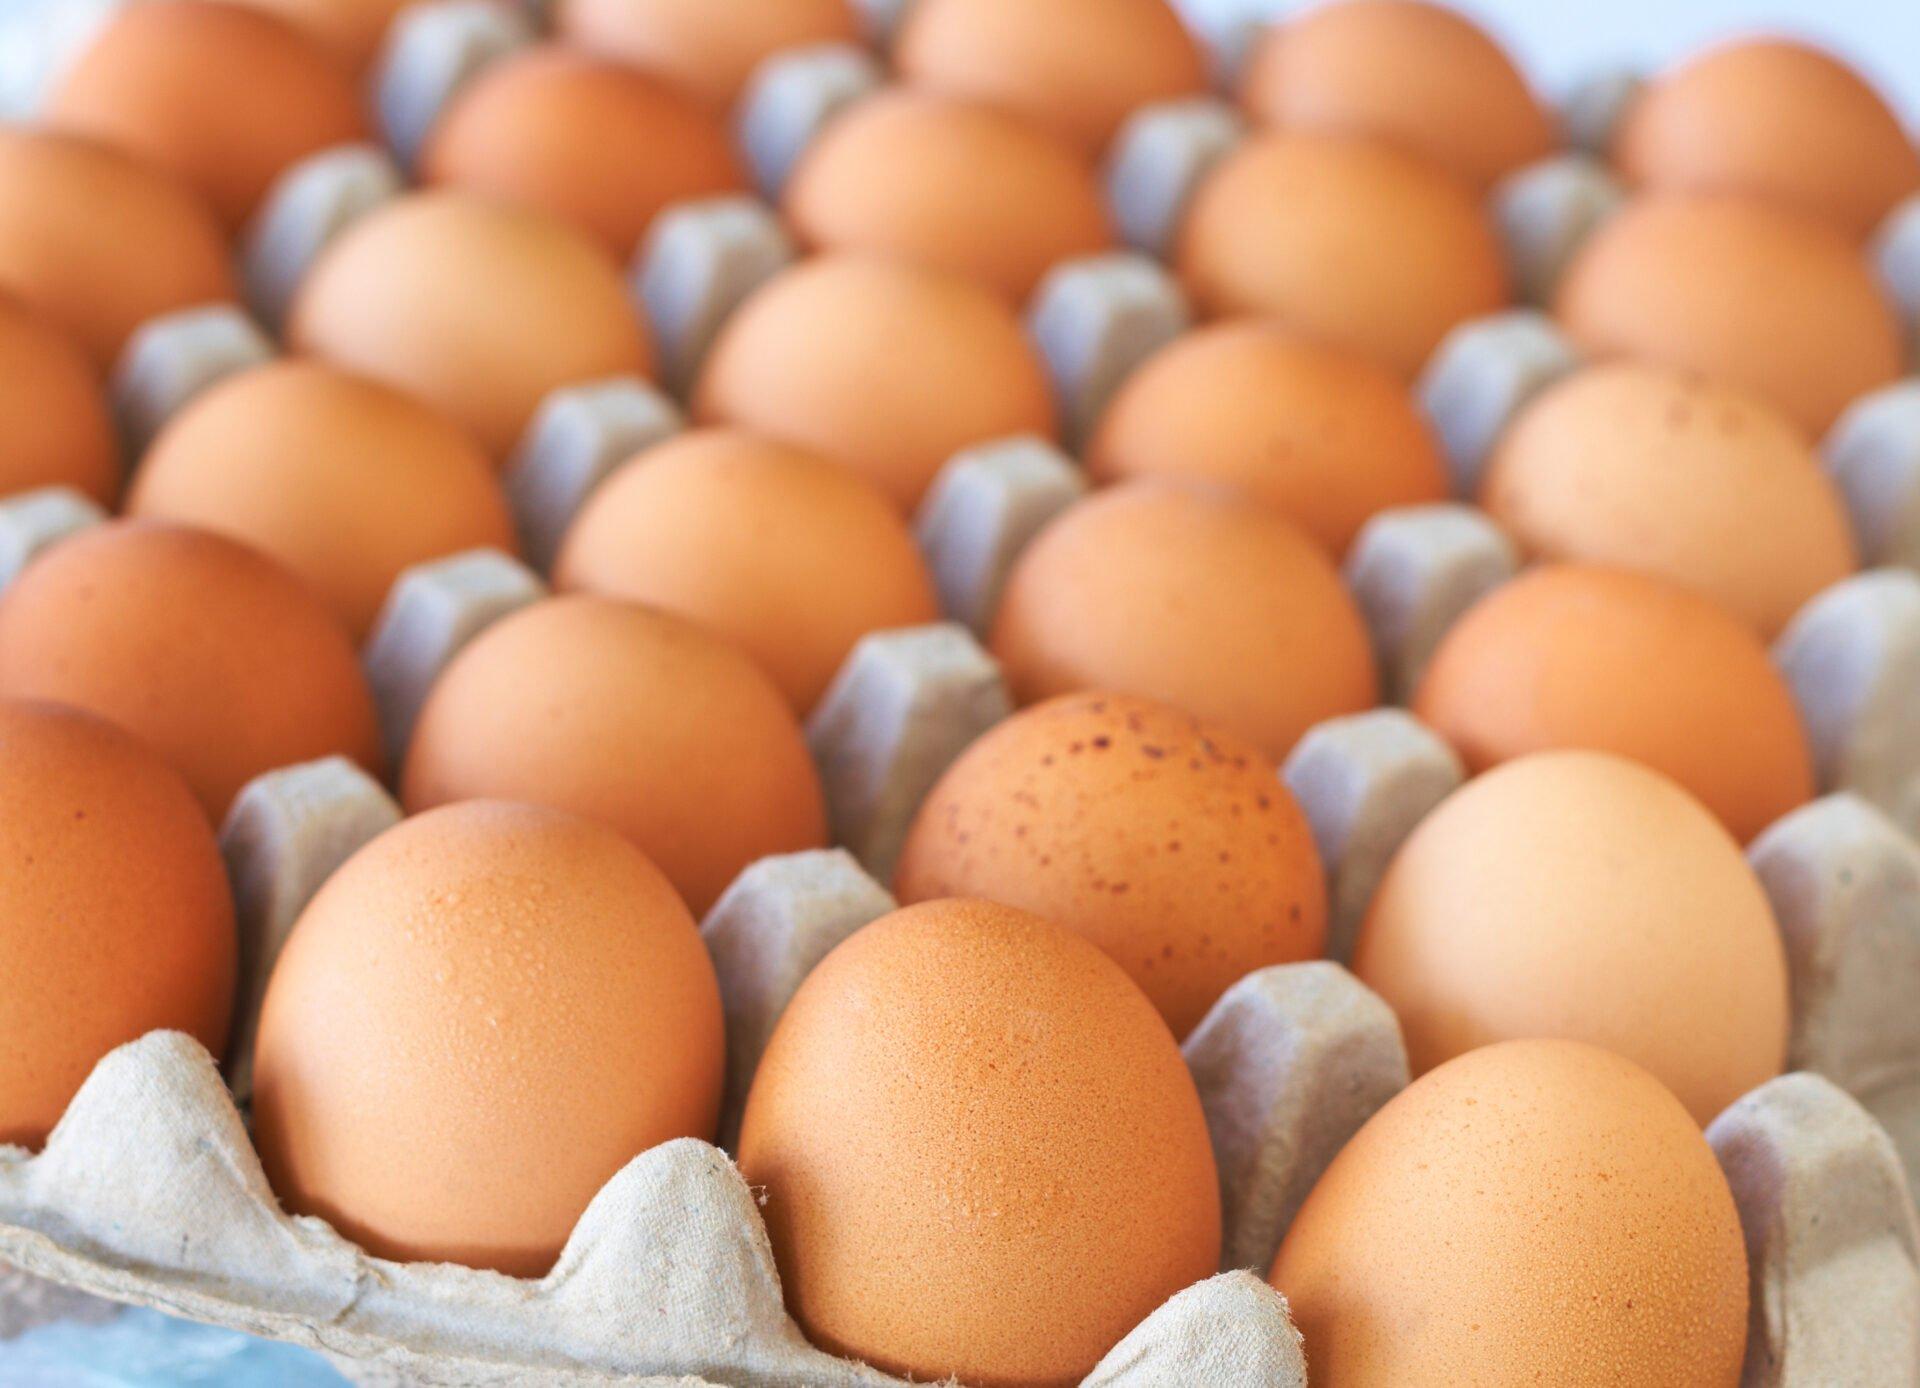 Full tray of freshly laid free range organic eggs